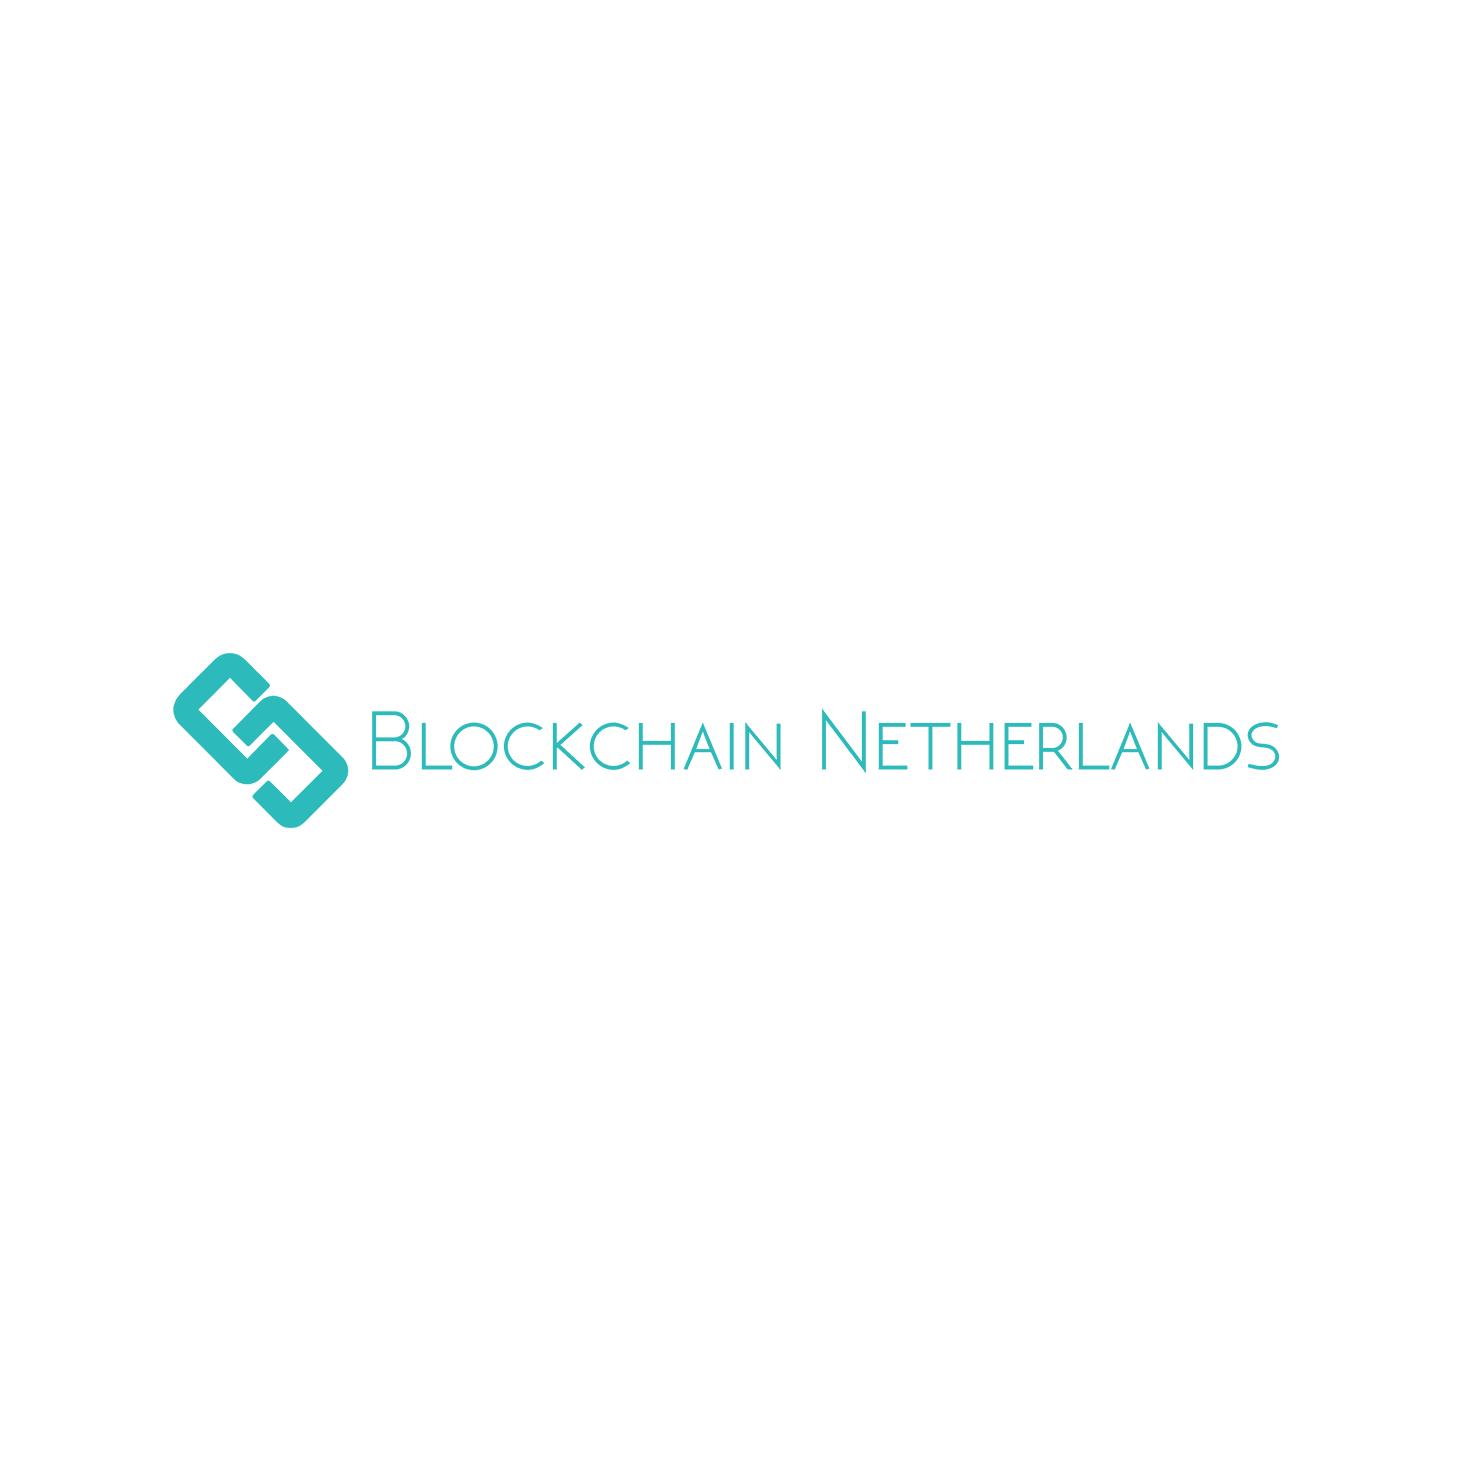 Blockchain Netherlands Logo